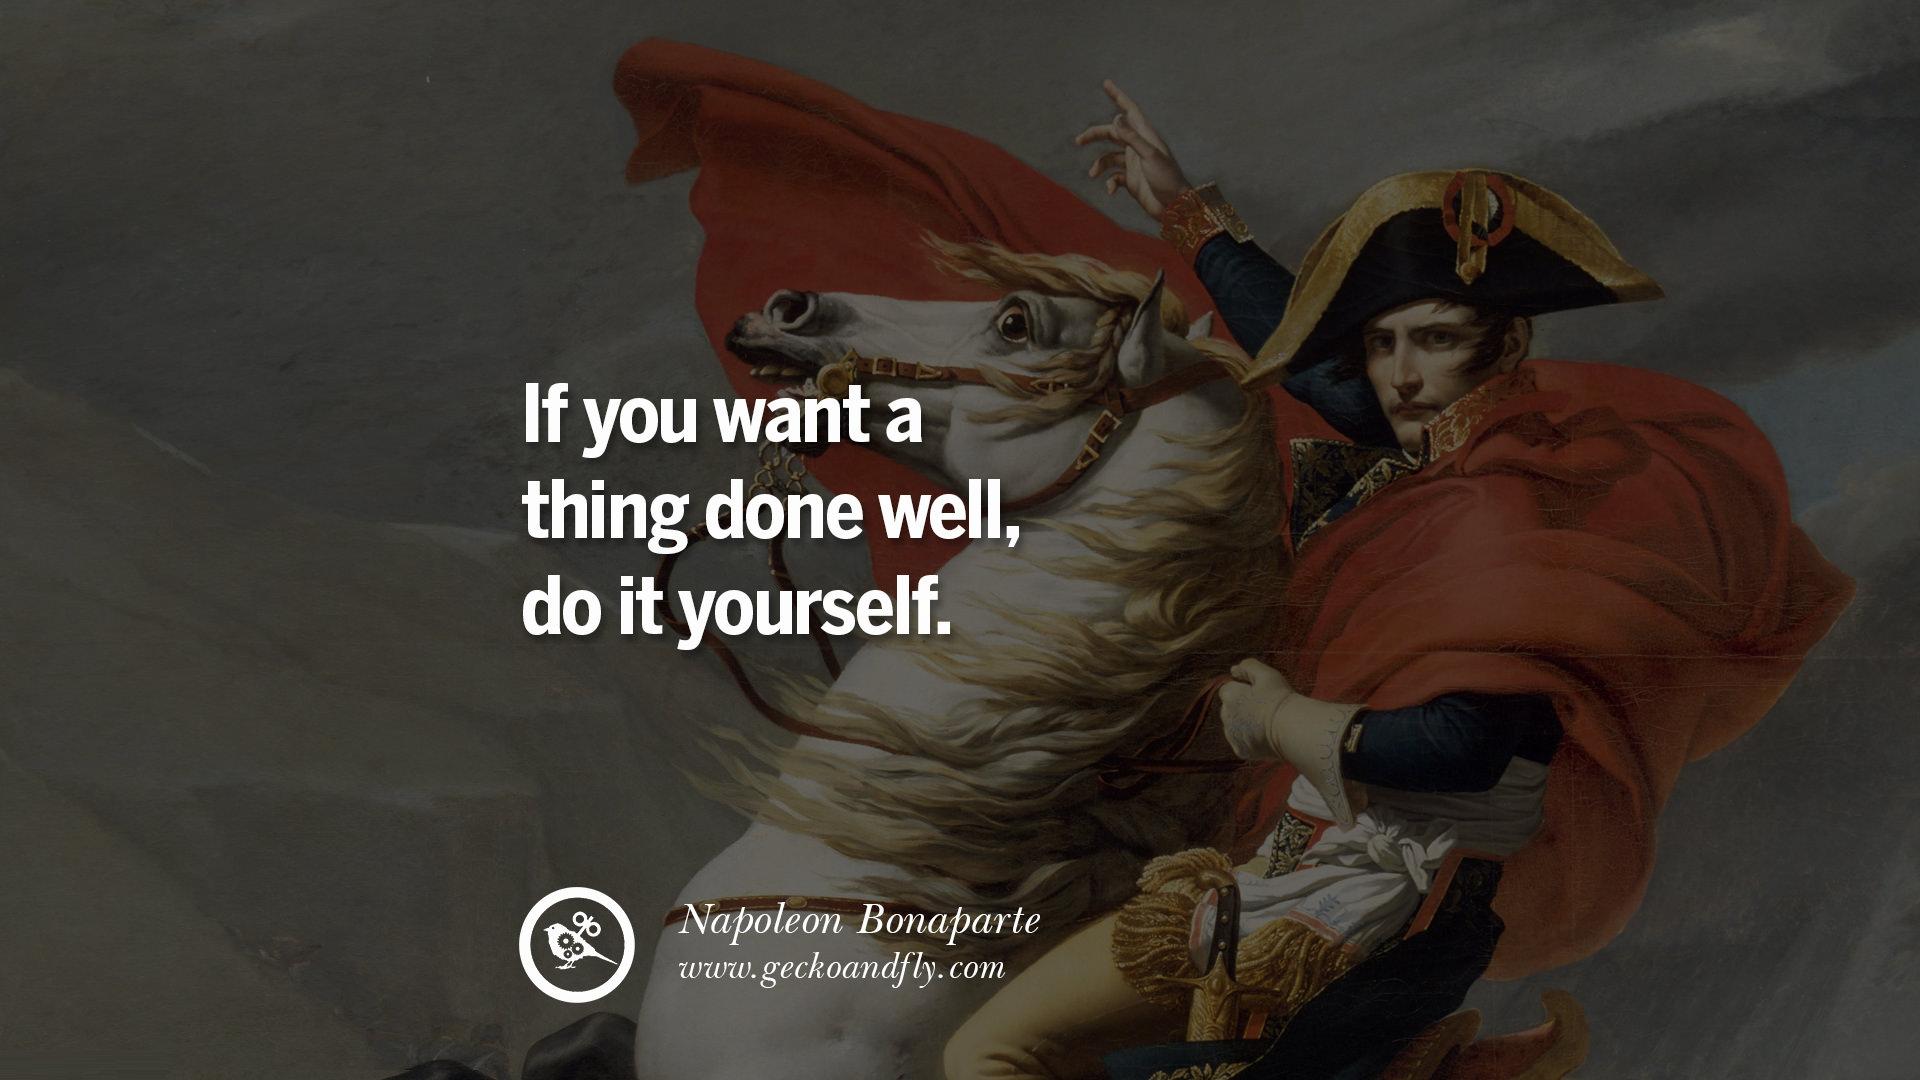 Game Of Thrones Quotes Wallpaper 1920x1080 40 Napoleon Bonaparte Quotes On War Religion Politics